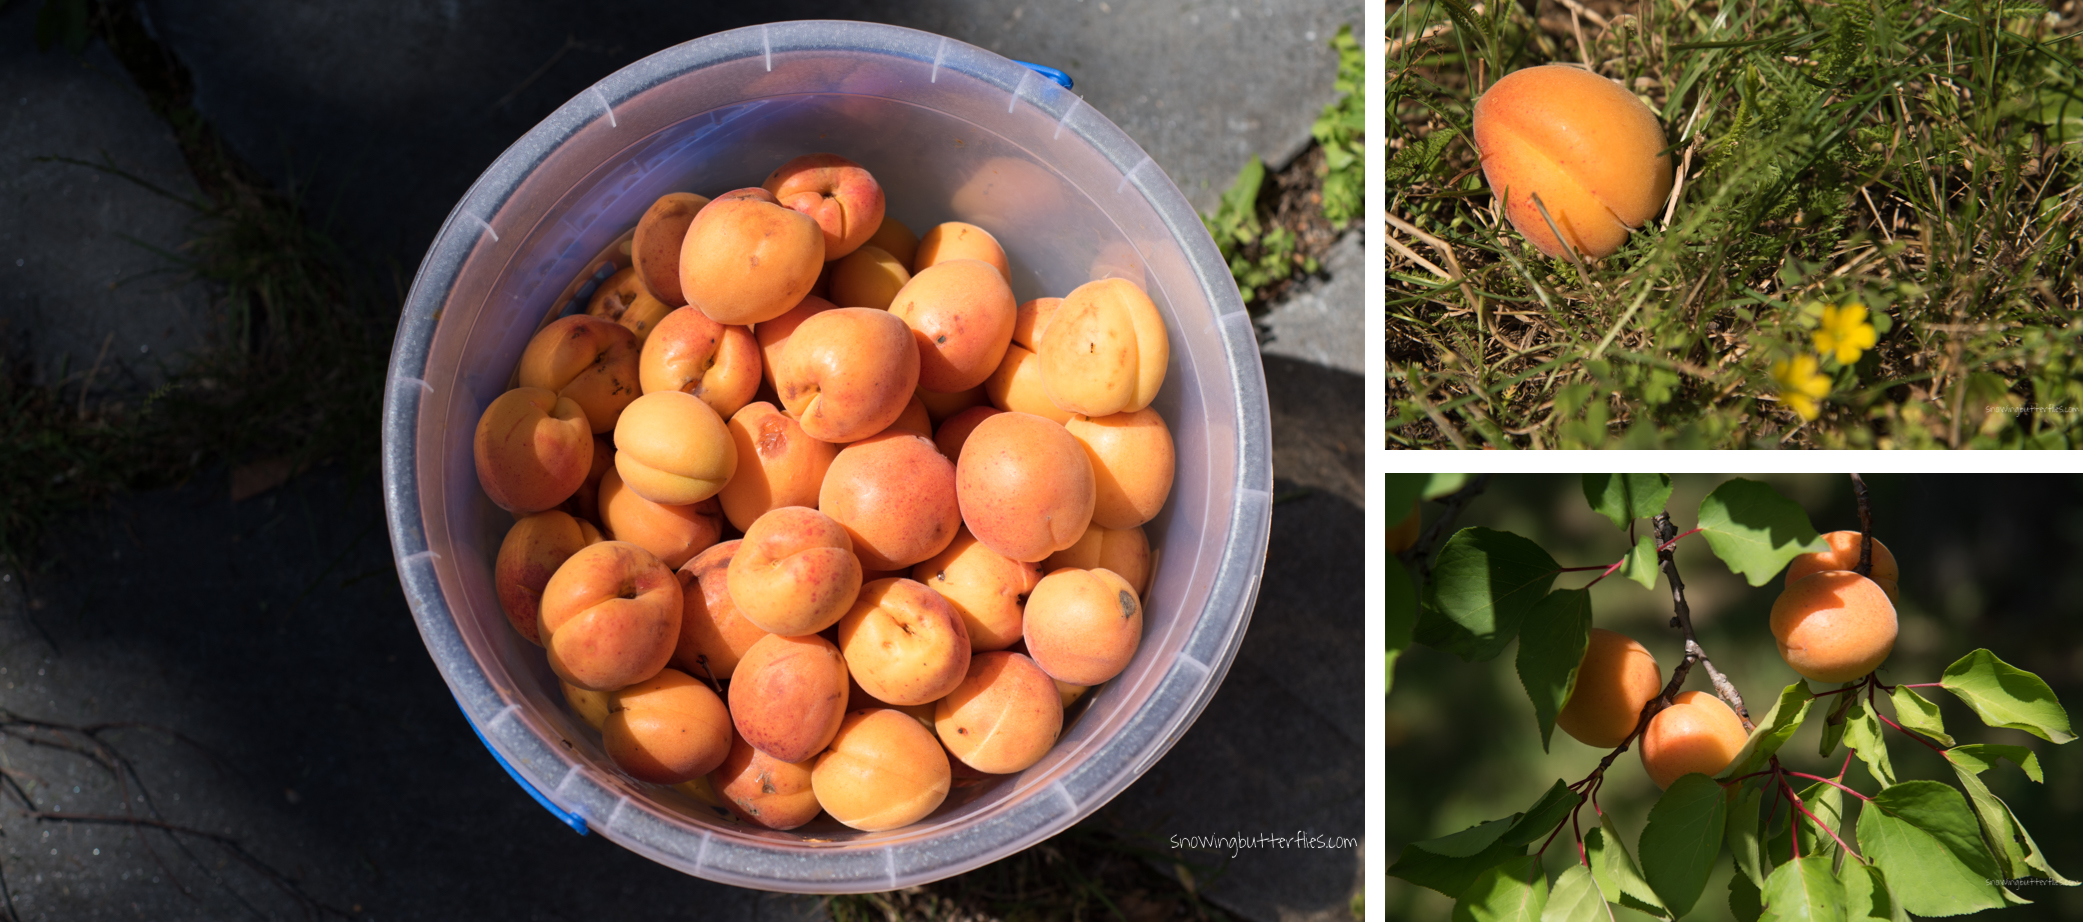 mariana perrone, austria, snowing butterflies, apricot, marmelade, still life